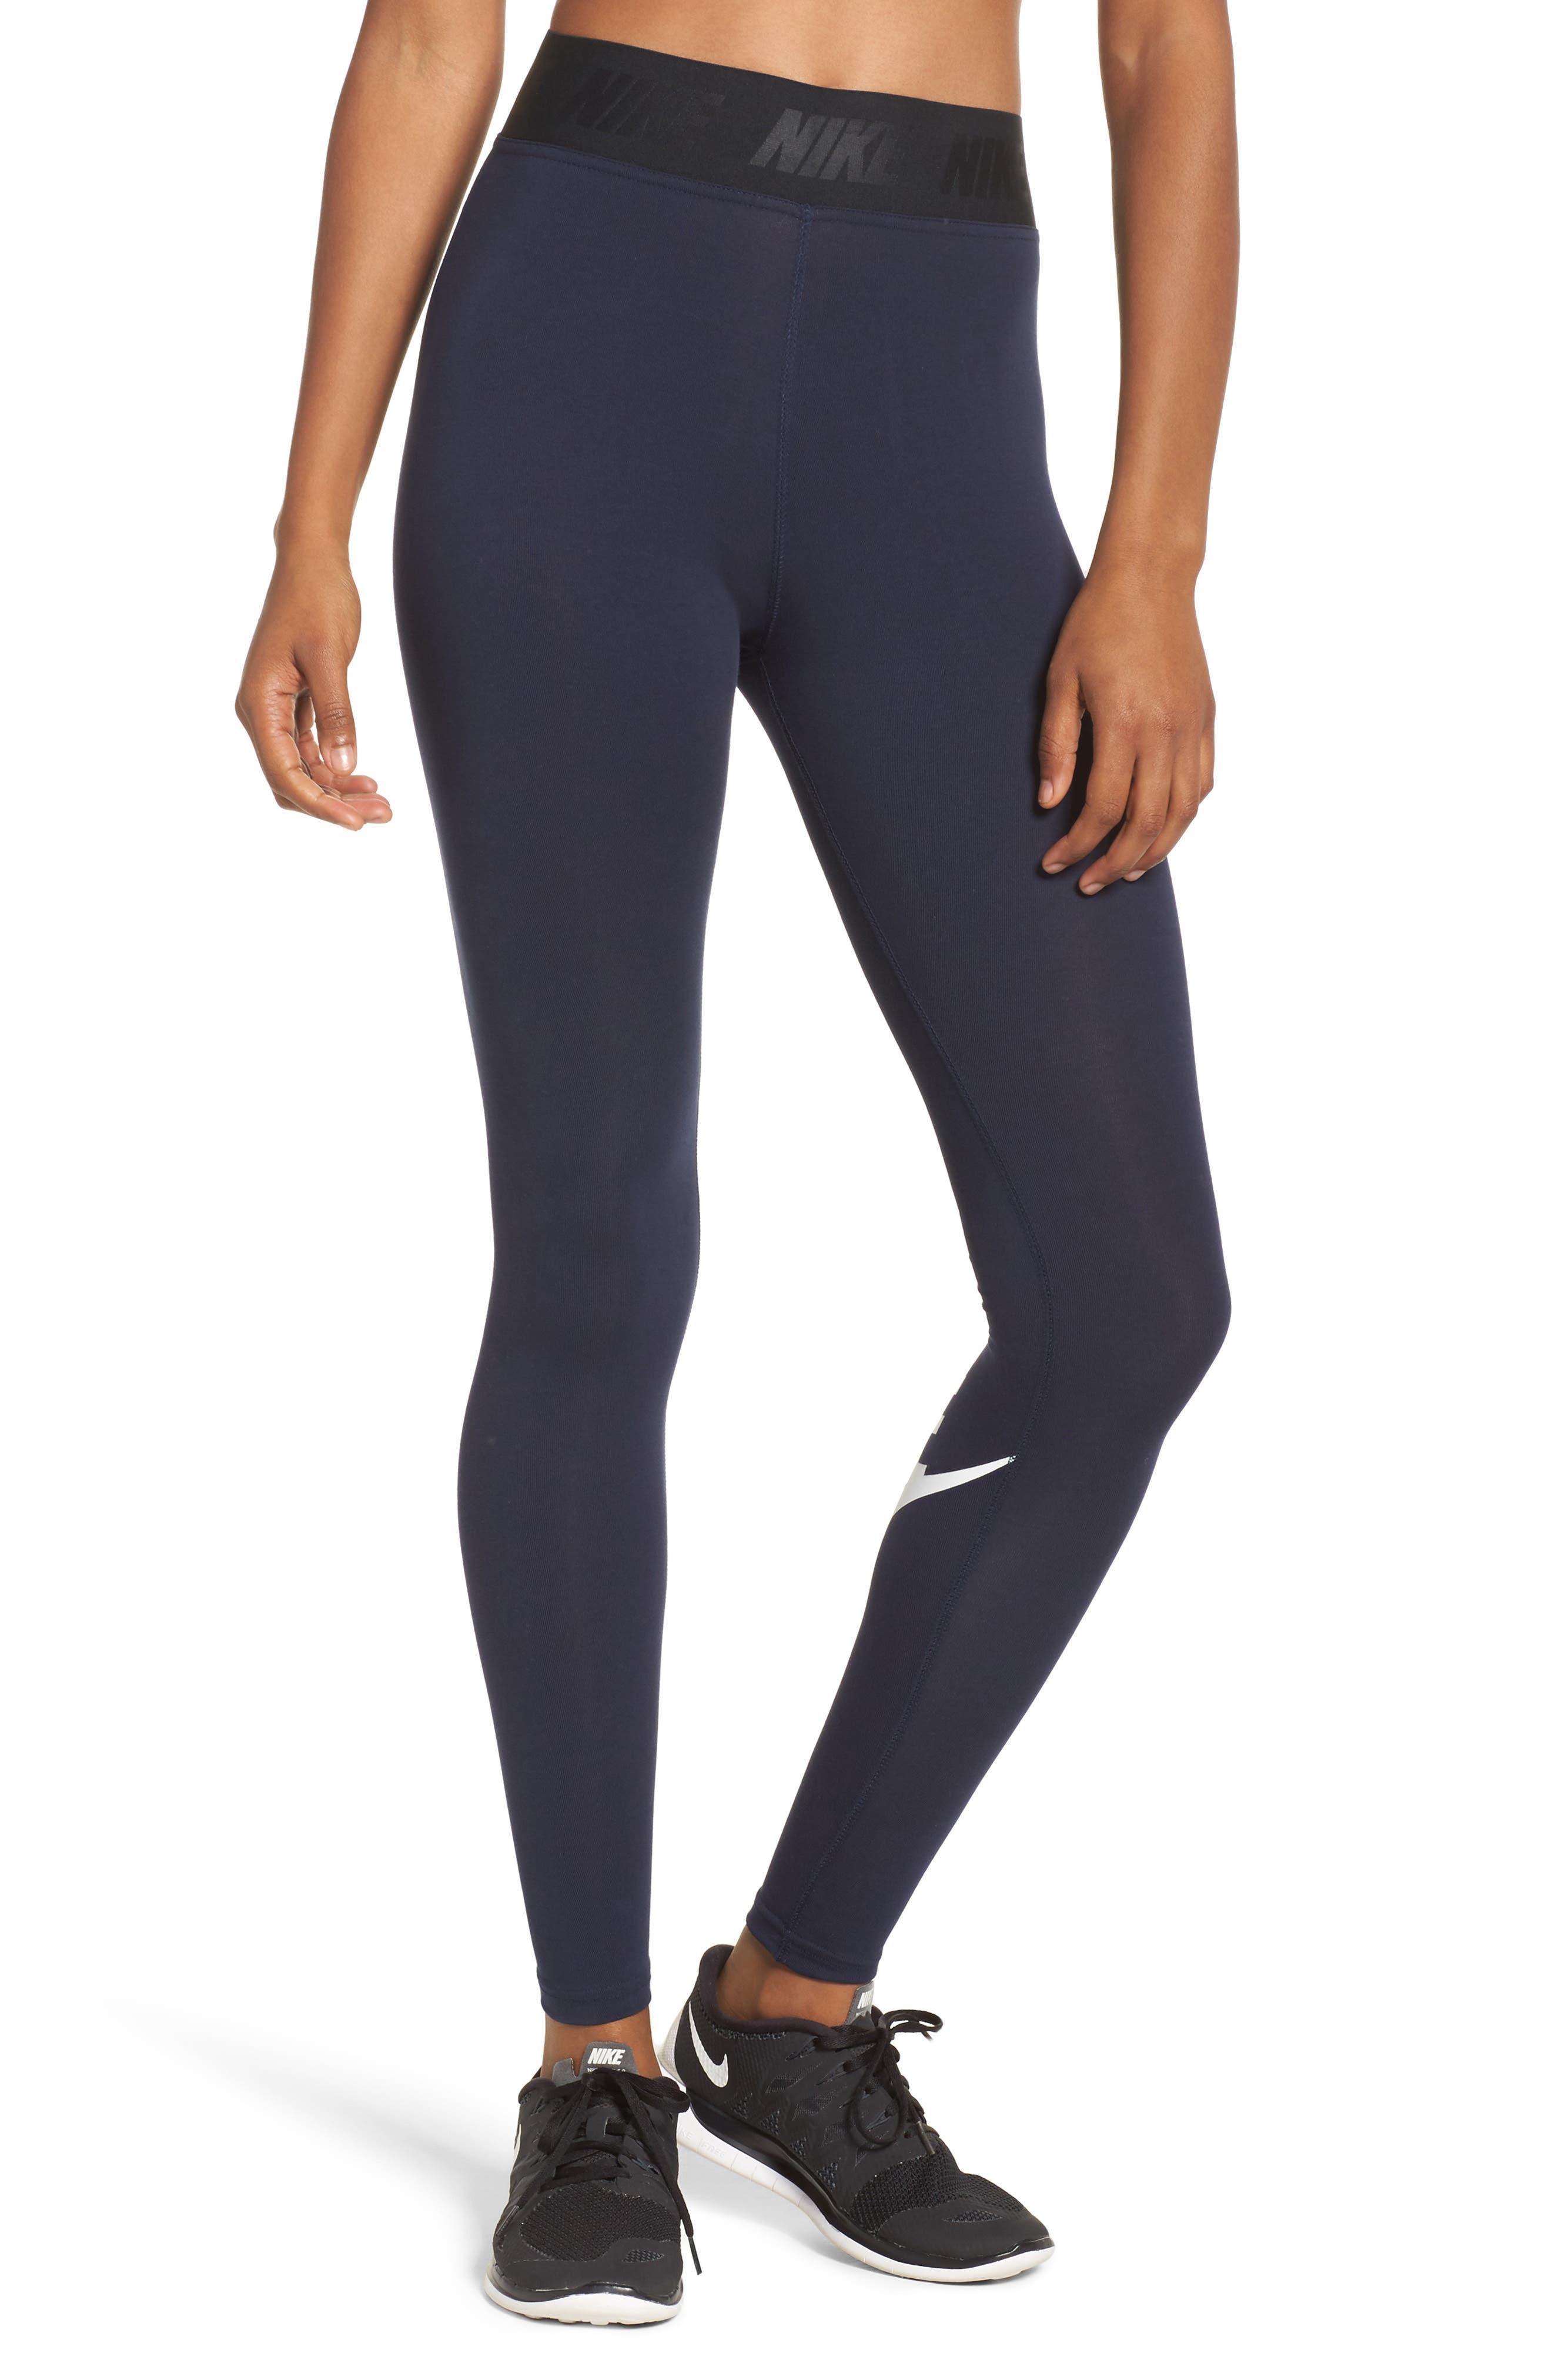 Alternate Image 1 Selected - Nike Leg-a-See High Waist Leggings